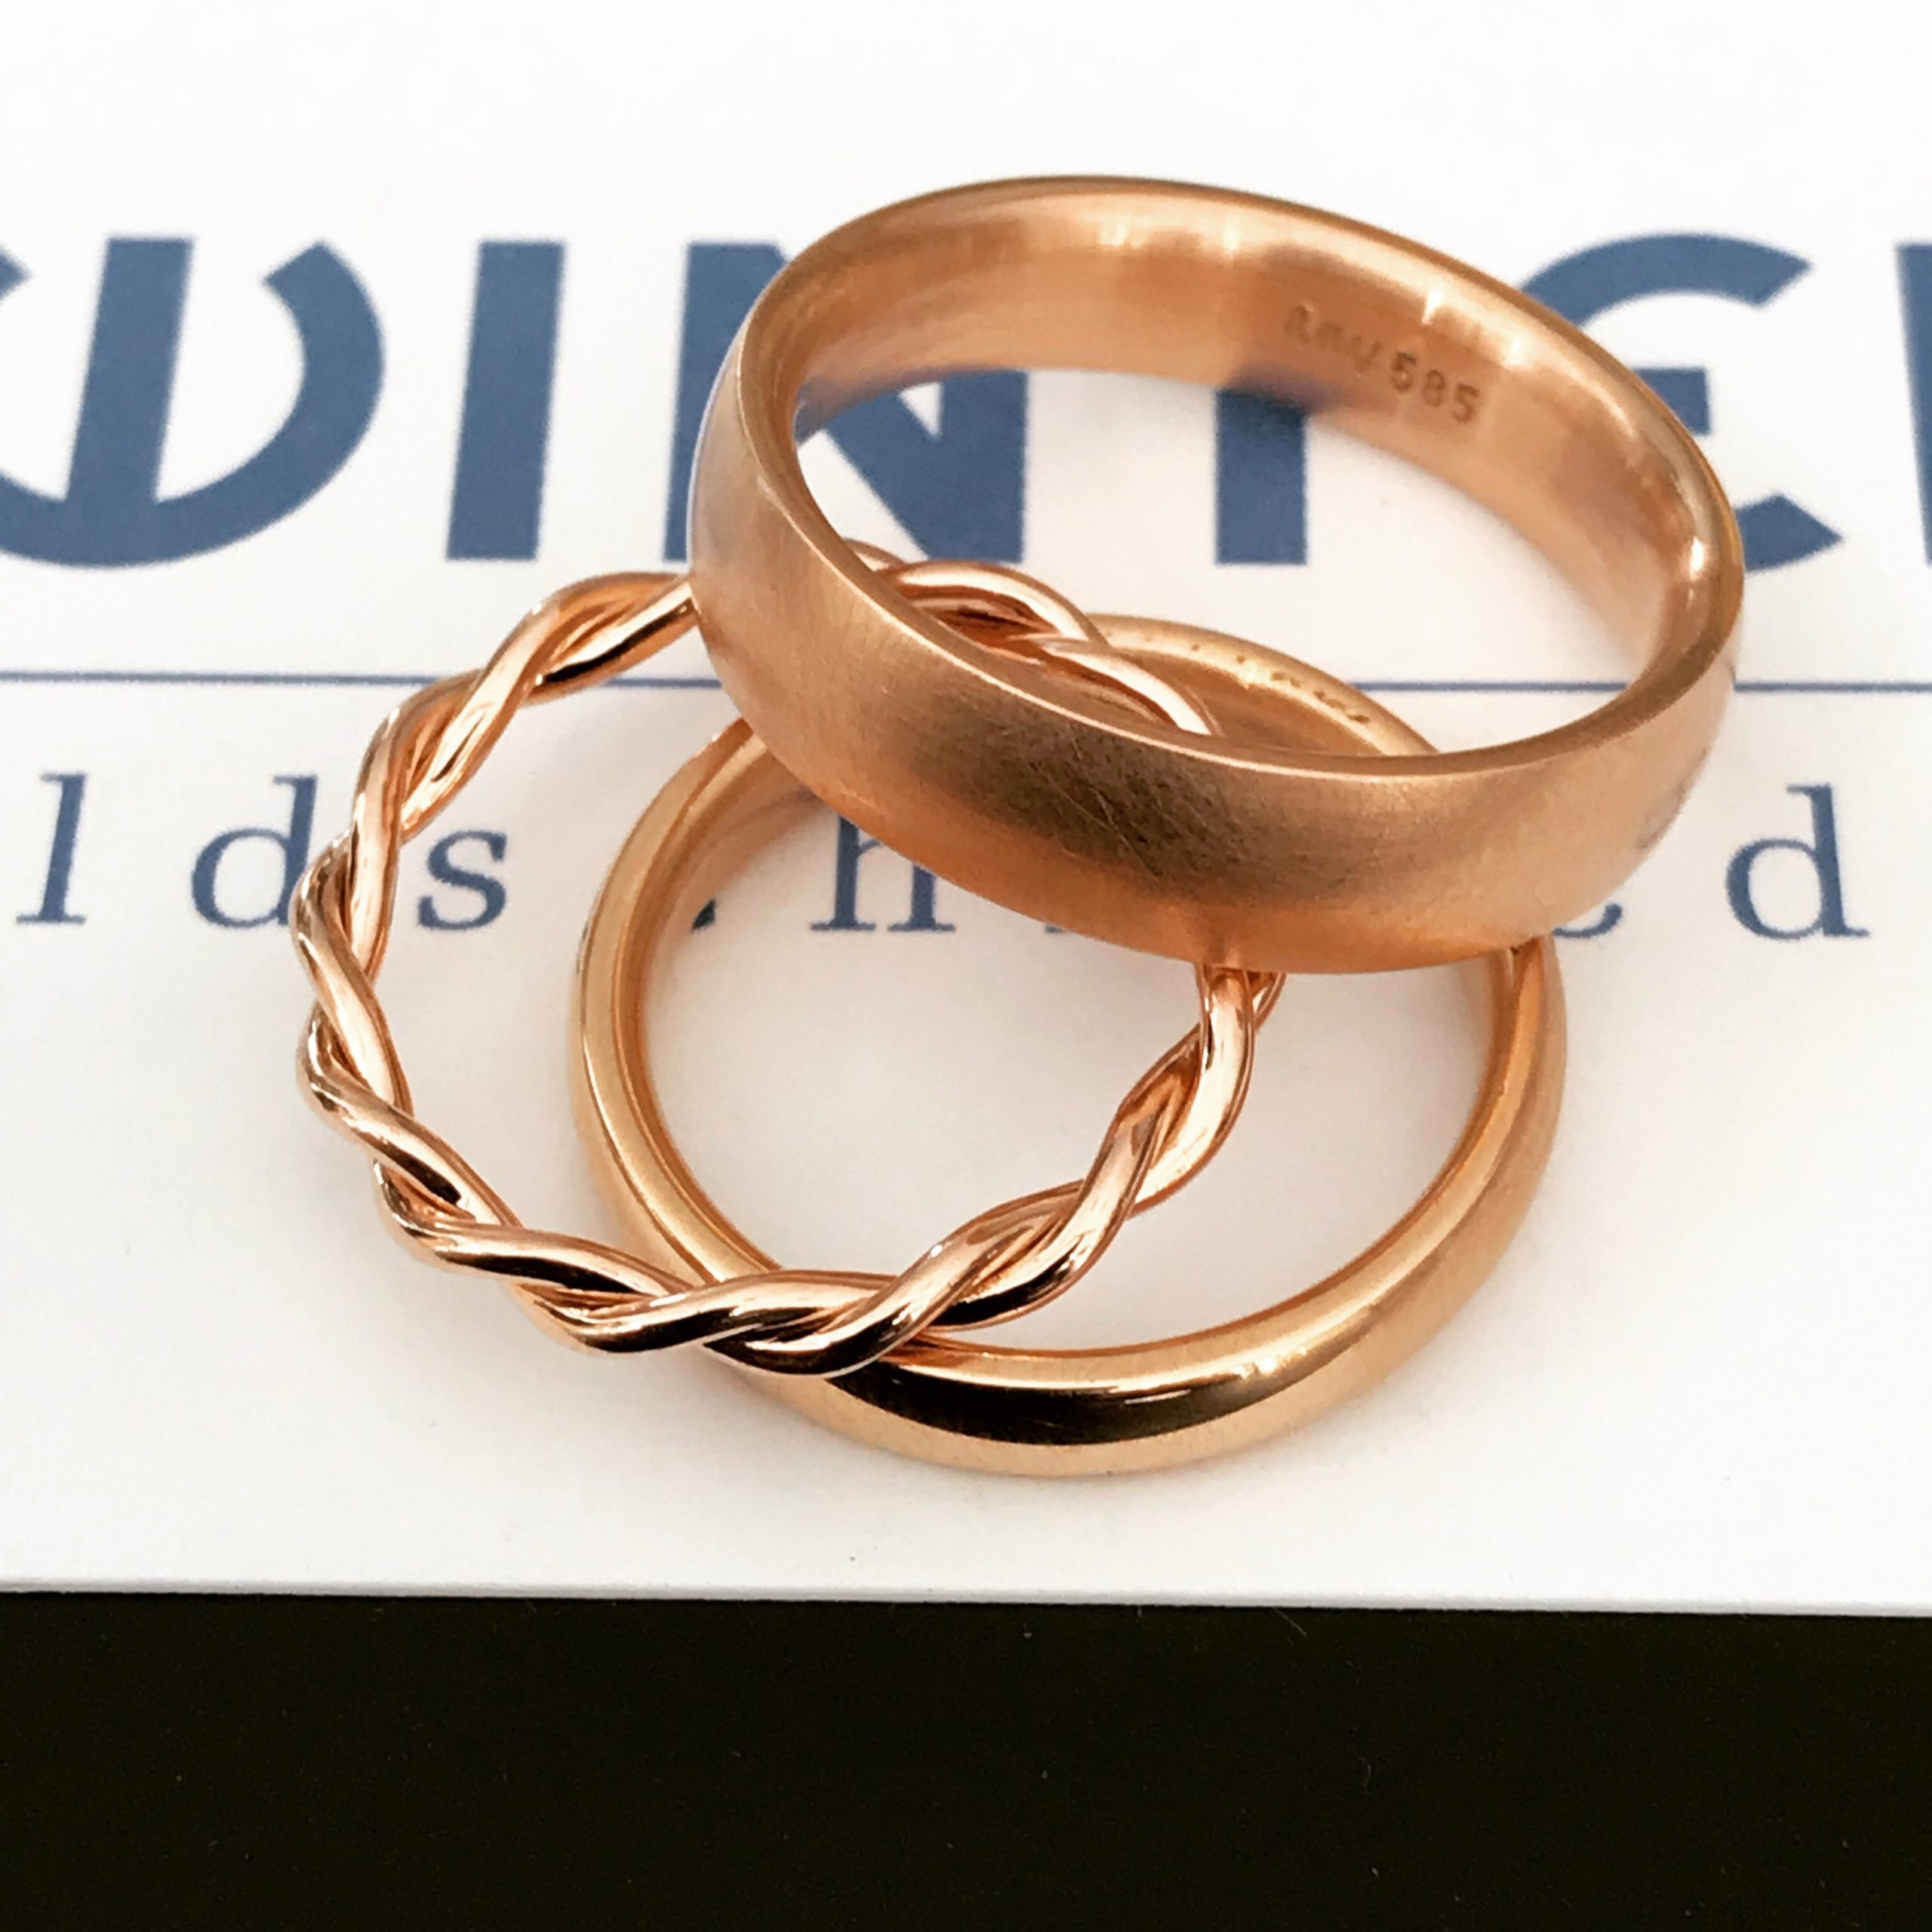 Eheringe & Verlobungsringe | Goldschmiede M. Winter